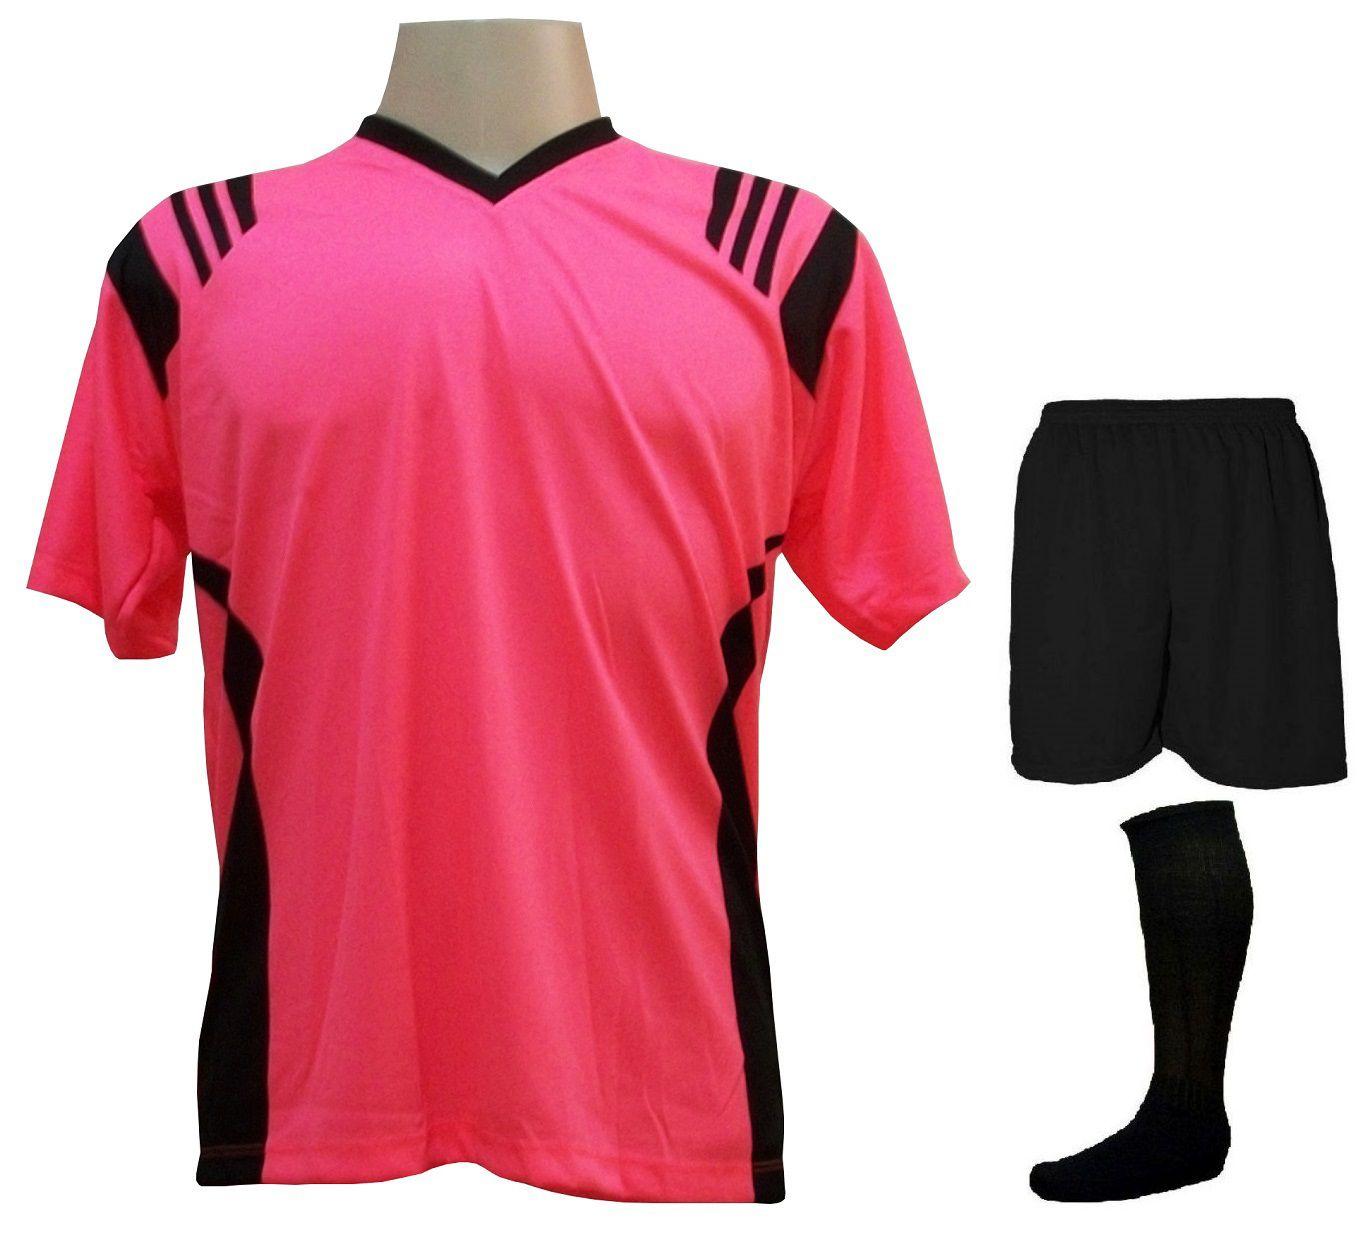 a2d0504d1b747 Fardamento Completo modelo Roma Rosa Preto 12+1 (12 camisas + 12 ...